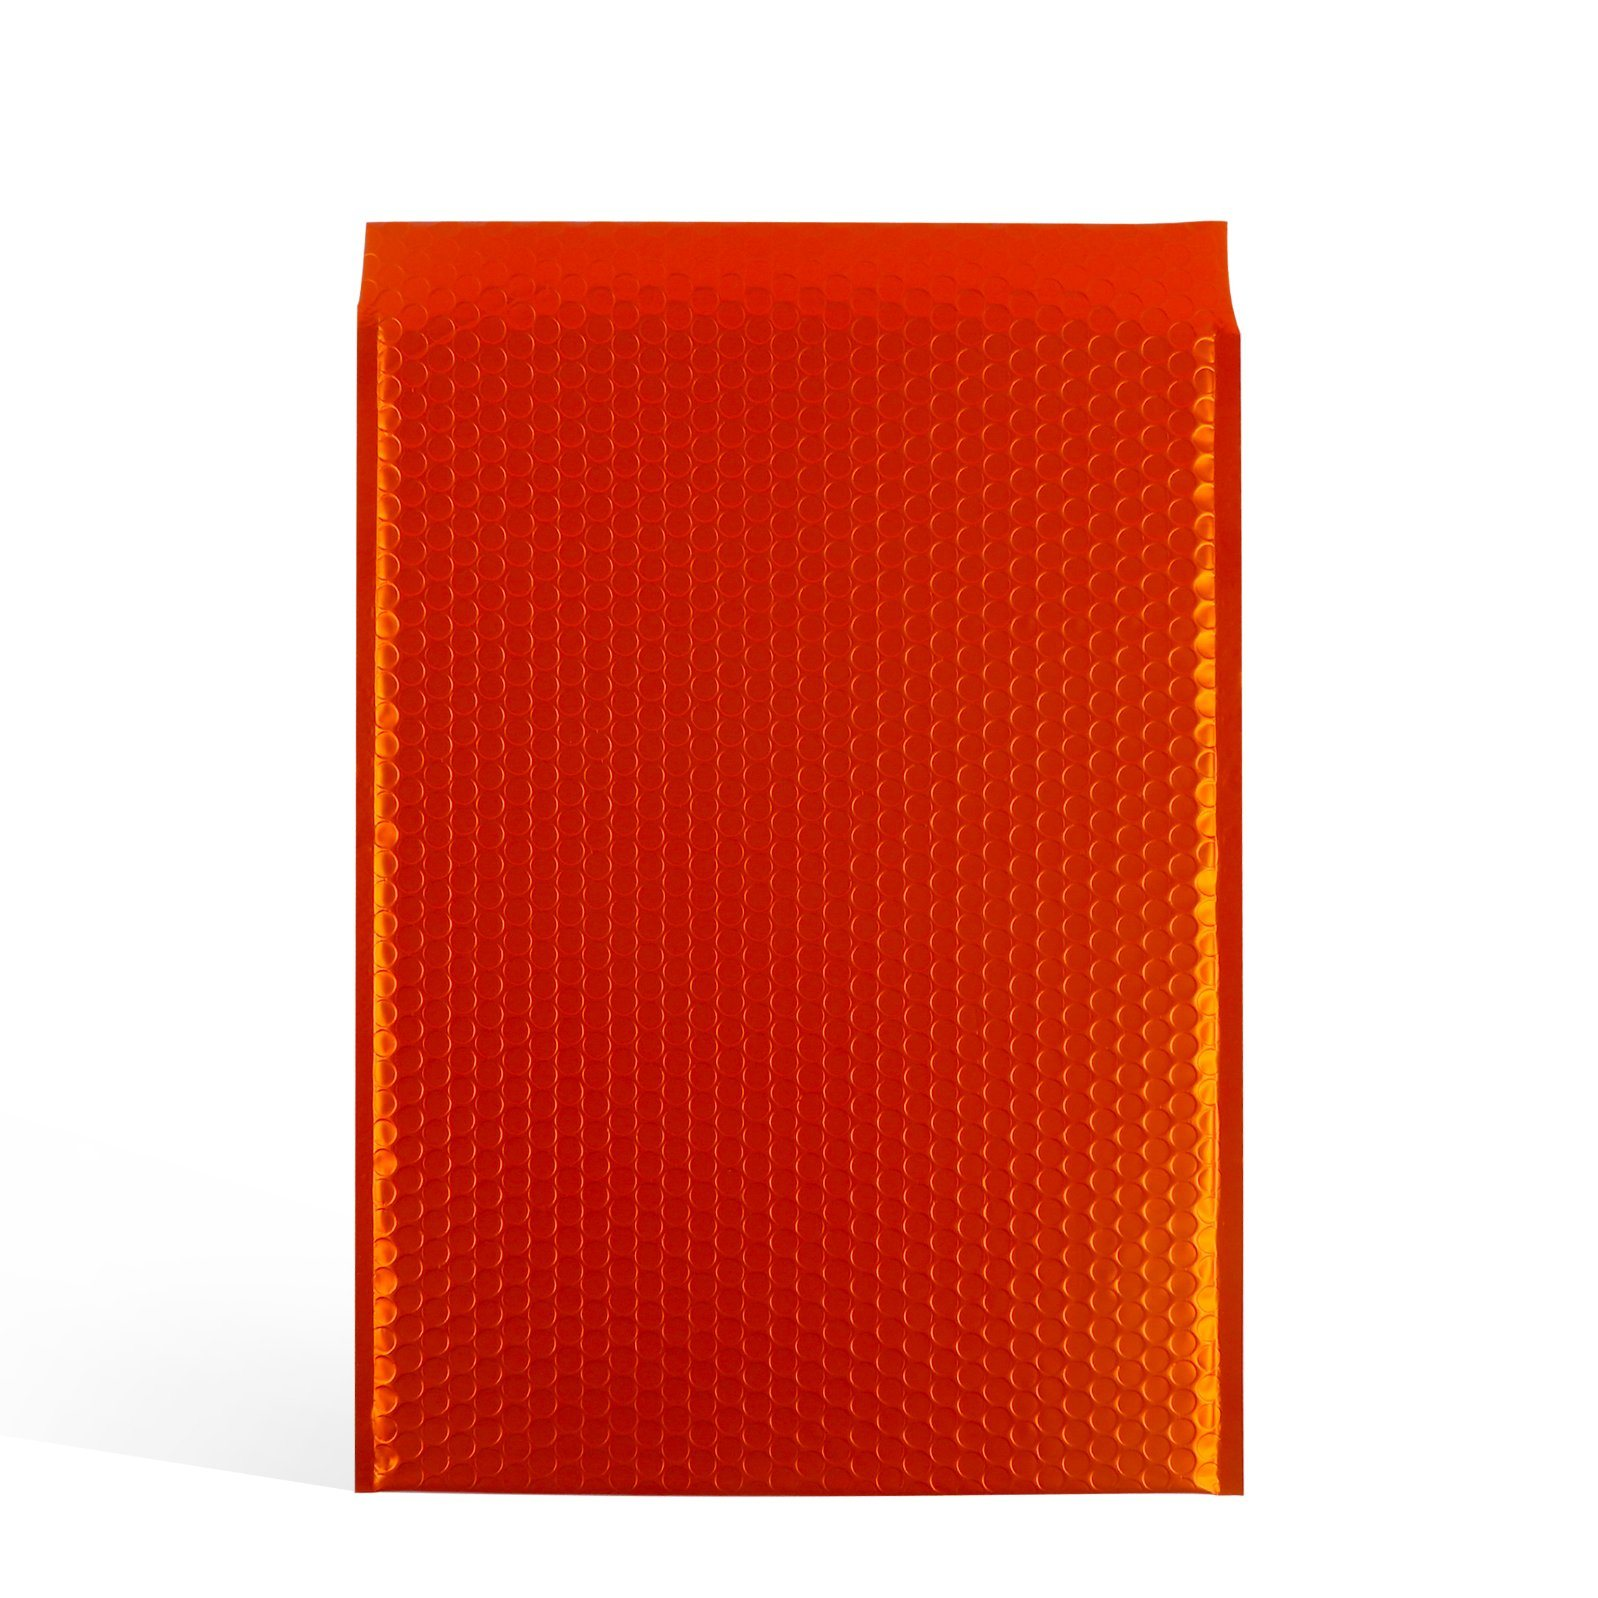 All Sizes Metallic Bubble Envelope Bags Foil Gloss Postal Coloured Pouches